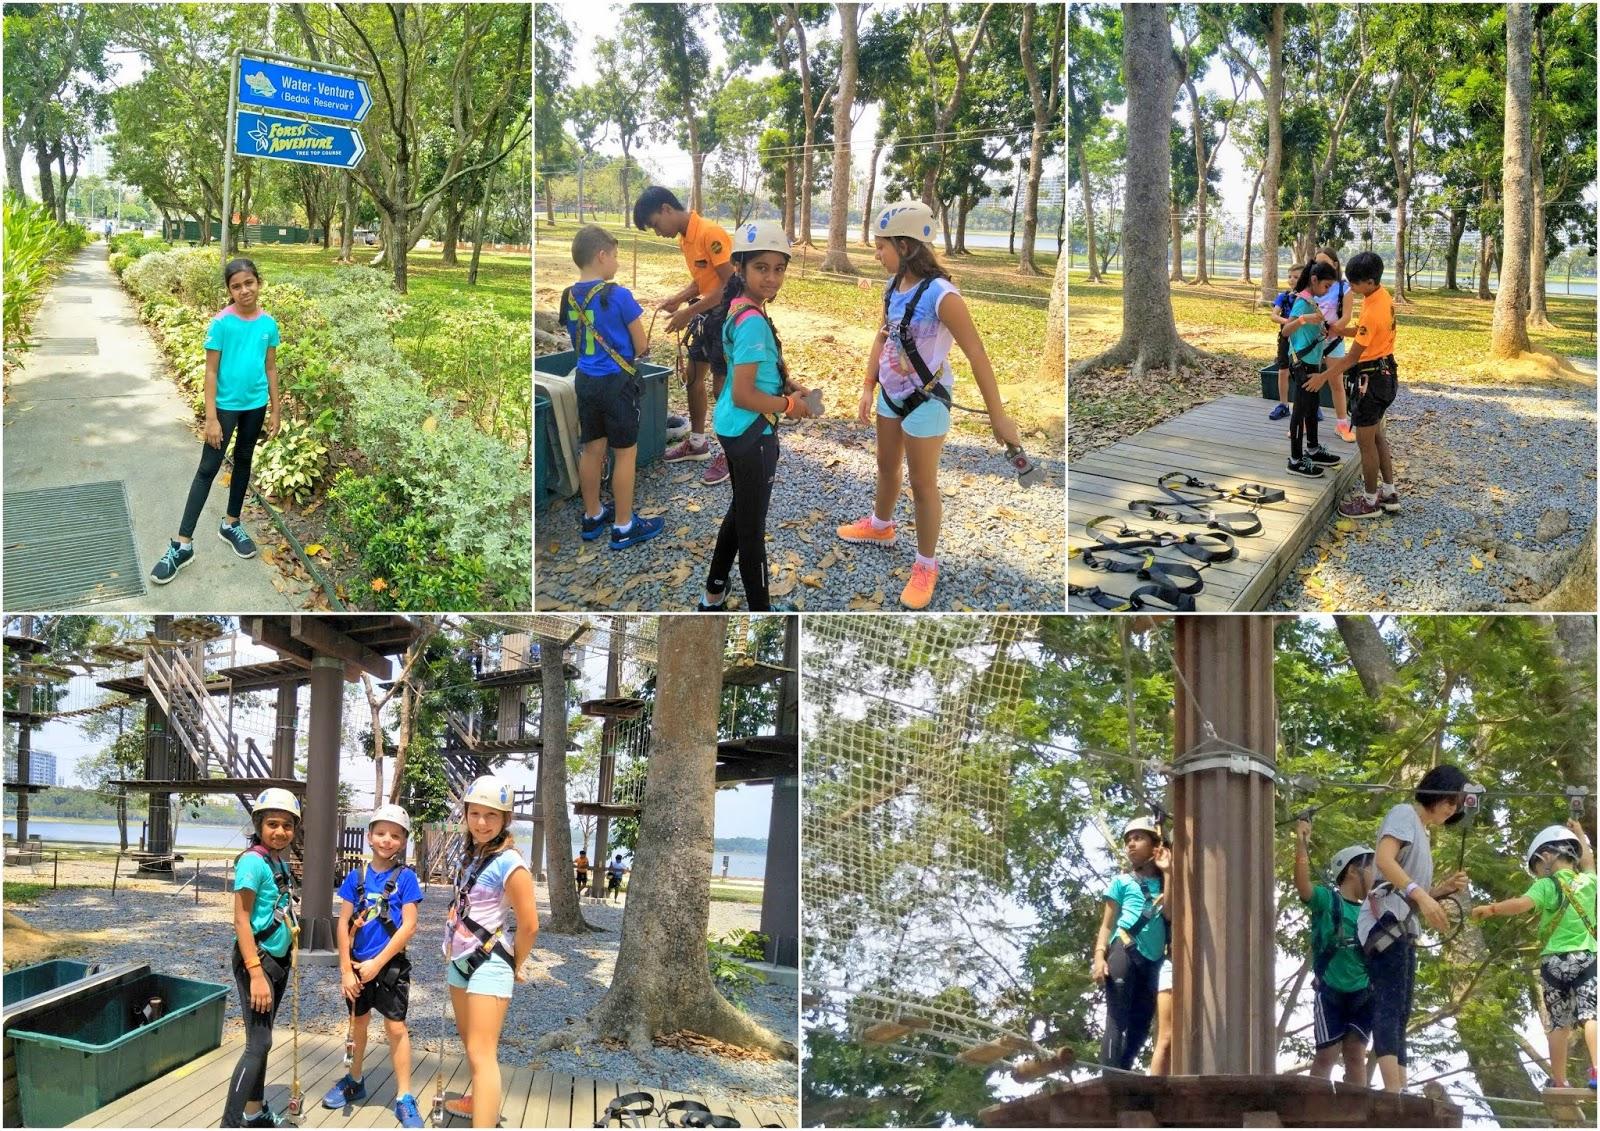 Advika S Adventures Advika S Adventures In Singapore Gardens Parks Playgrounds